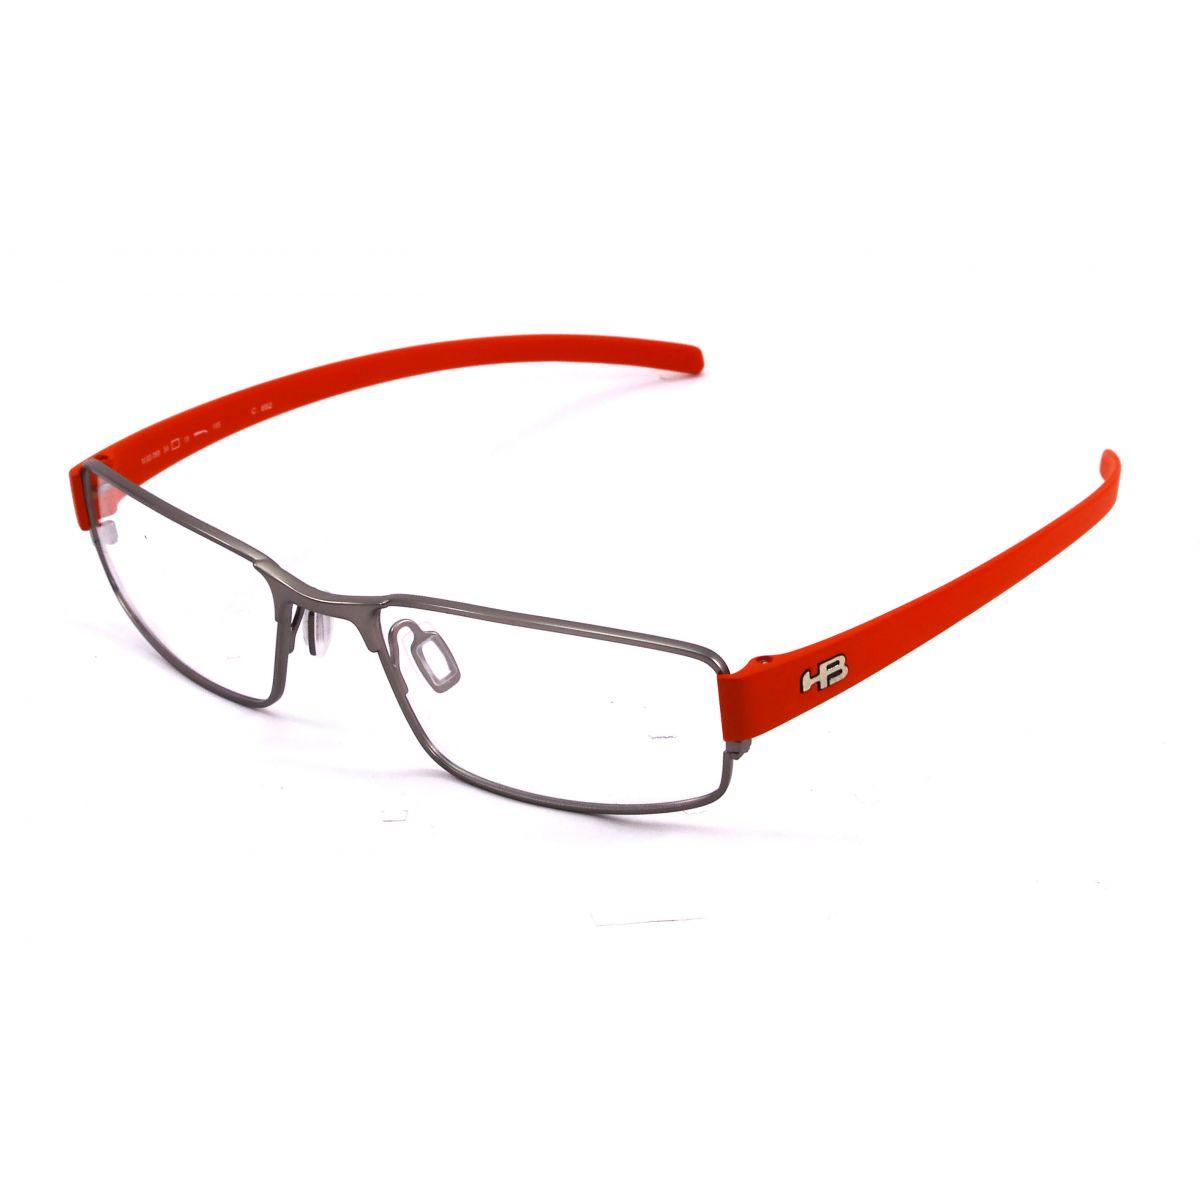 bcf6bf2ca Óculos de Grau Masculino HB M9306965233 Tam.54HBHBCompra segura ...